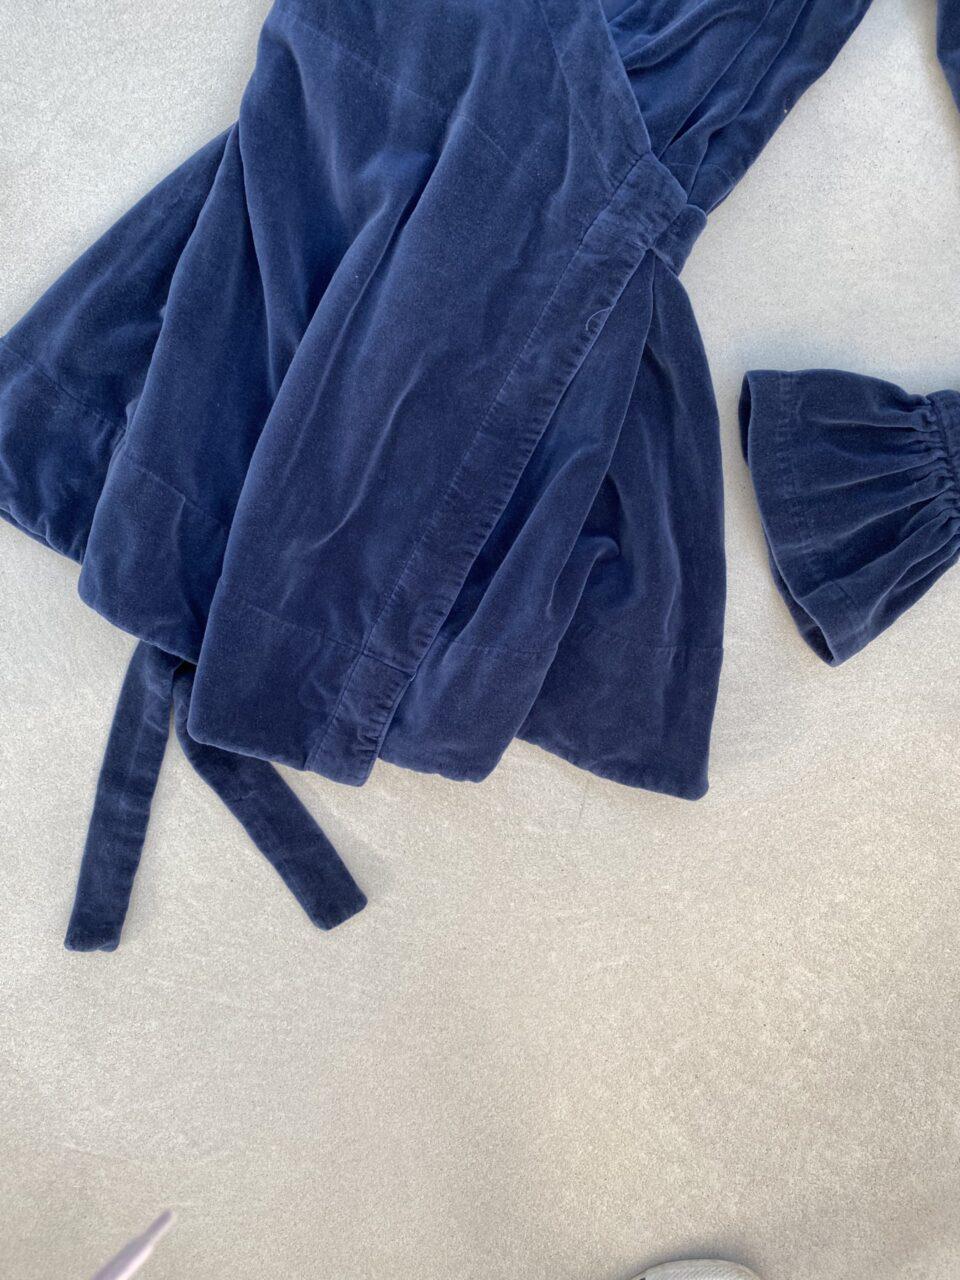 blauw fluwelen jurkje op betonvloer